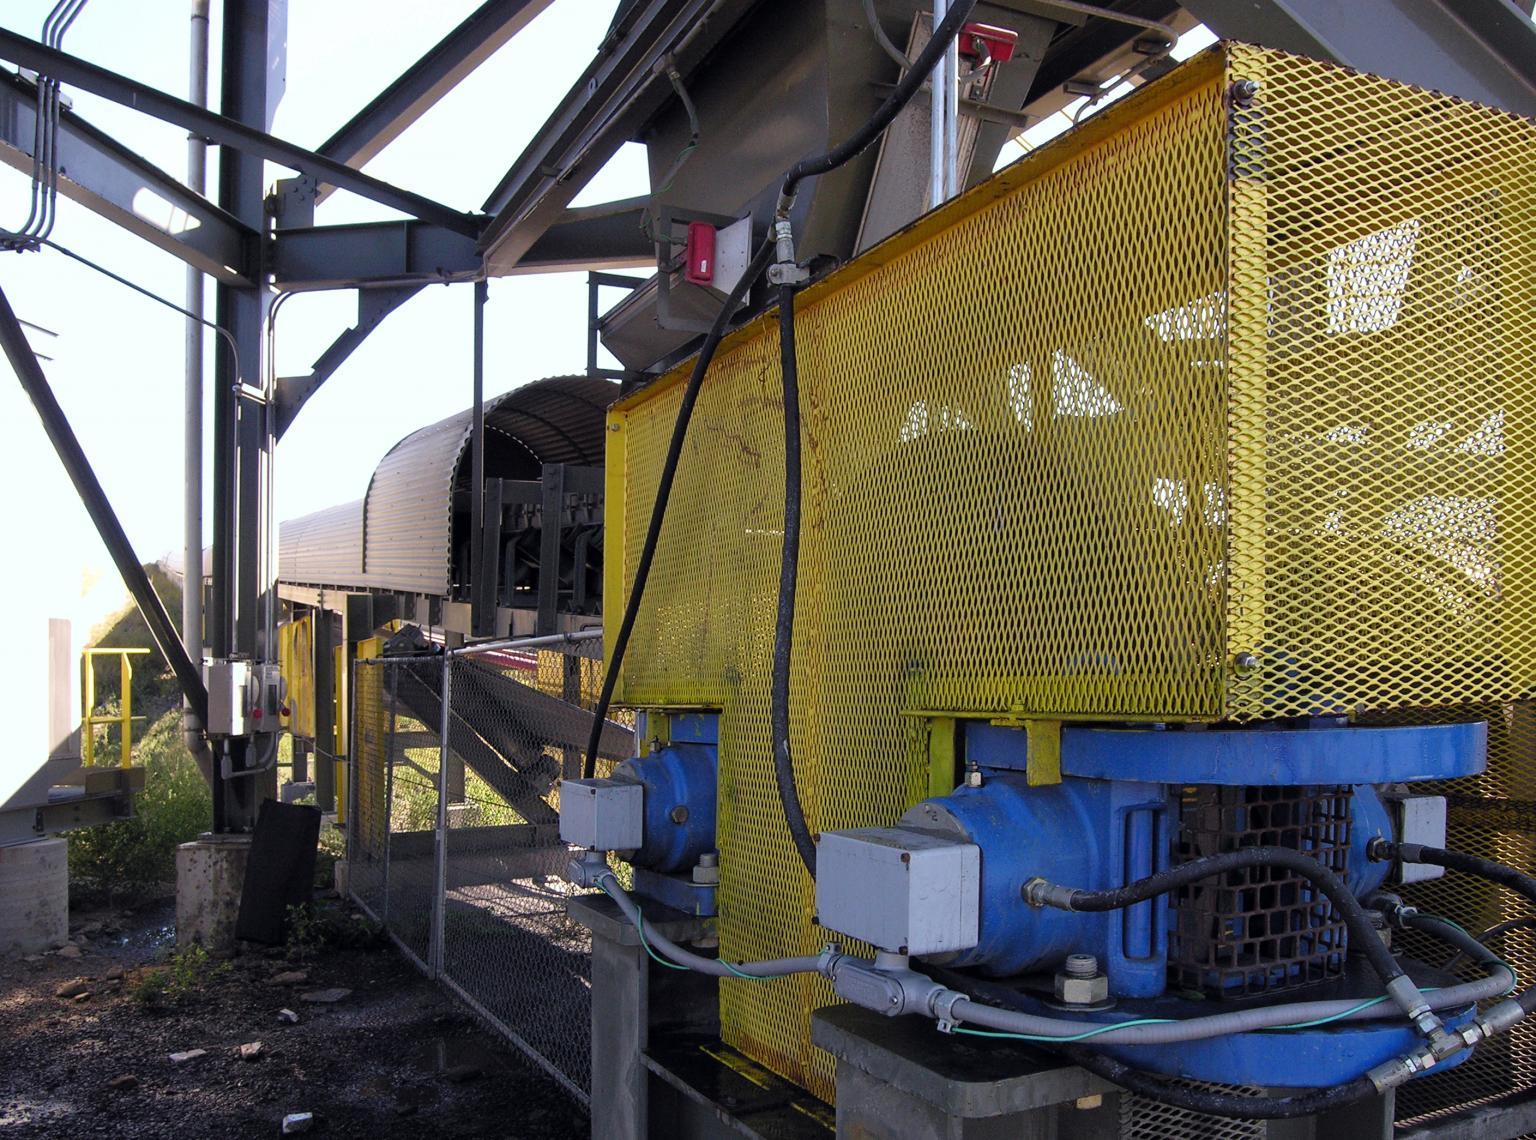 Twiflex VKSD spring applied, hydraulic released brake units fitted on copper mine conveyor in Tasmania, Australia